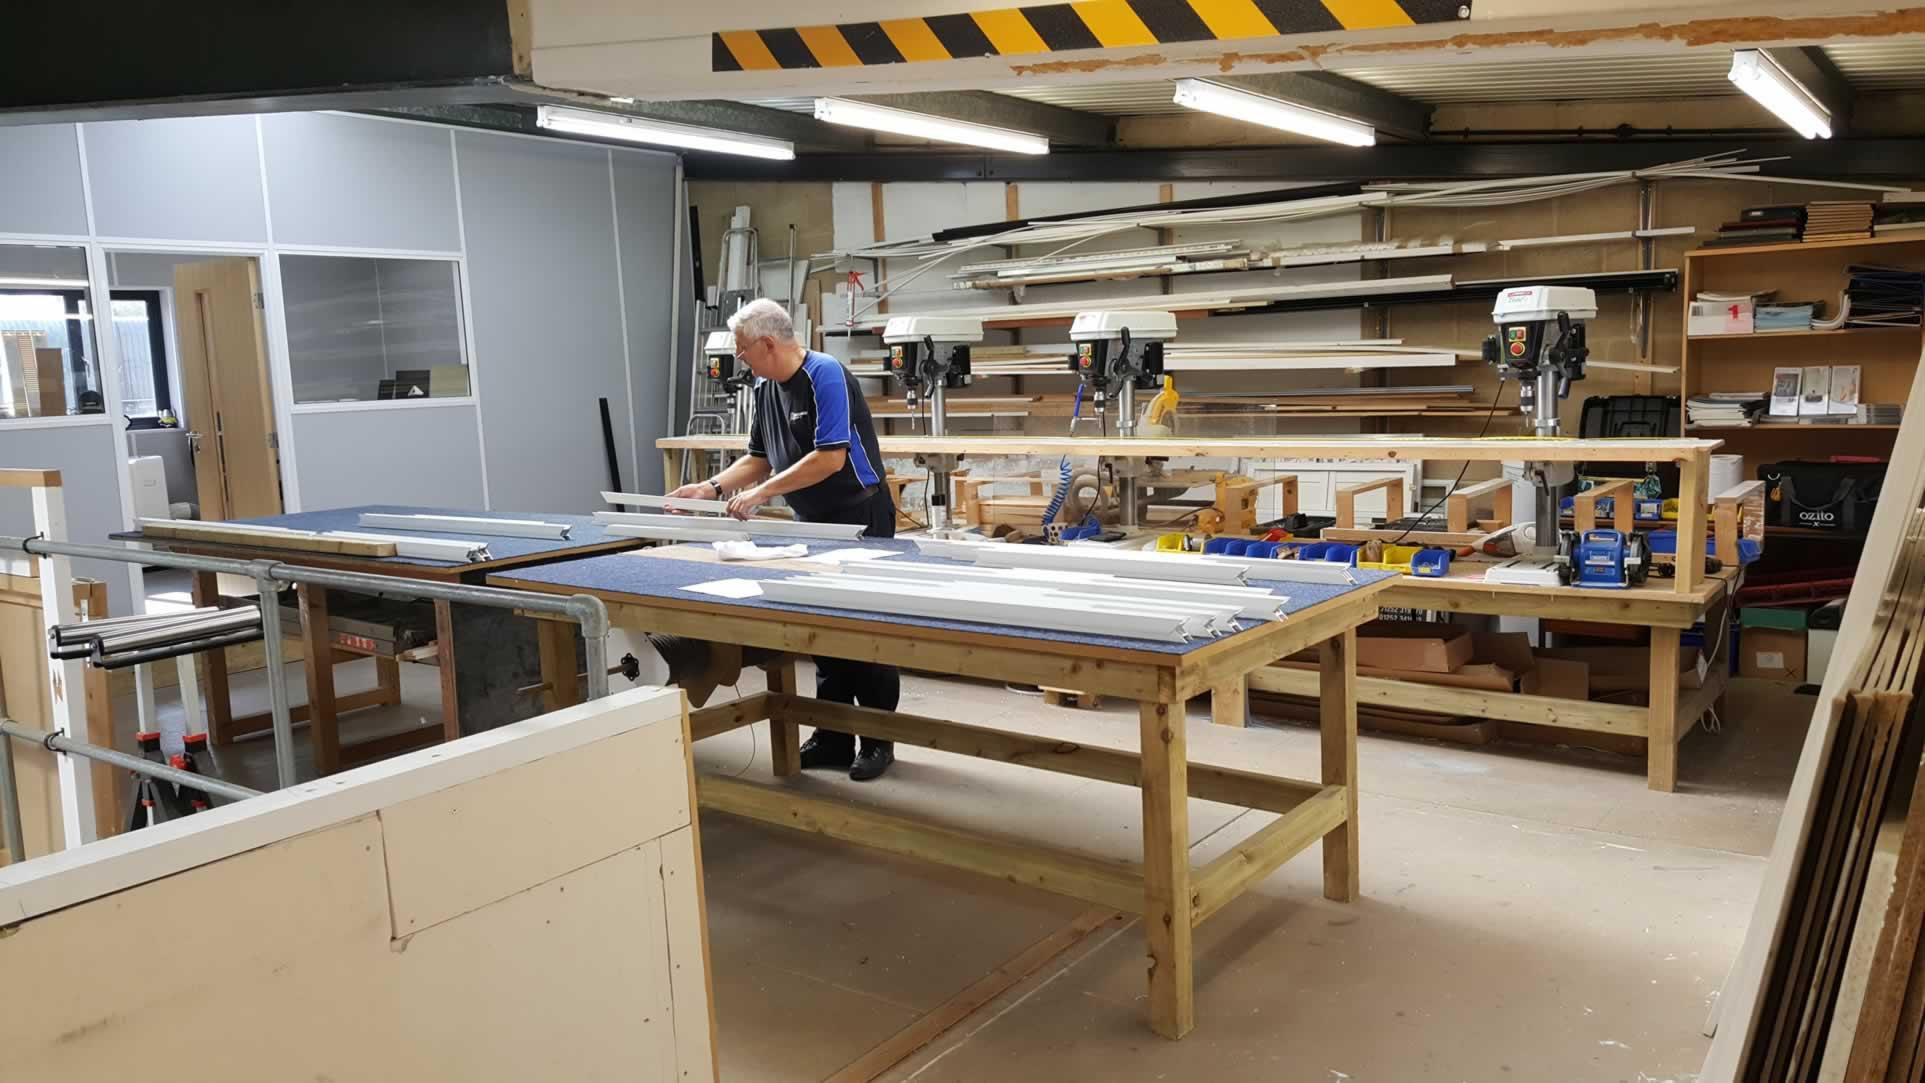 Secondary Glazing Master Workbench